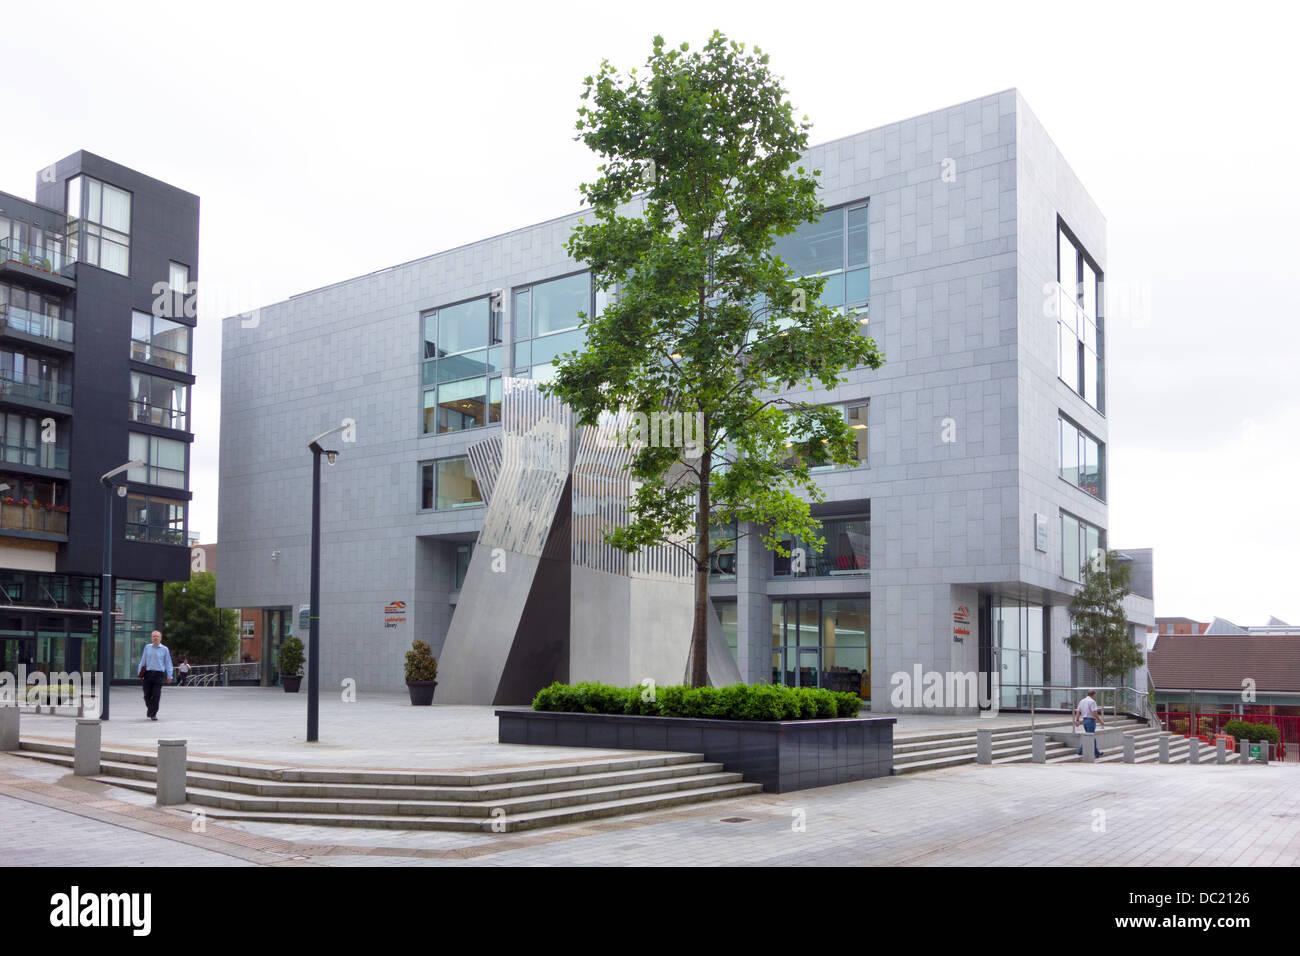 South County Dublin public library building at Tallaght, County Dublin Ireland - Stock Image